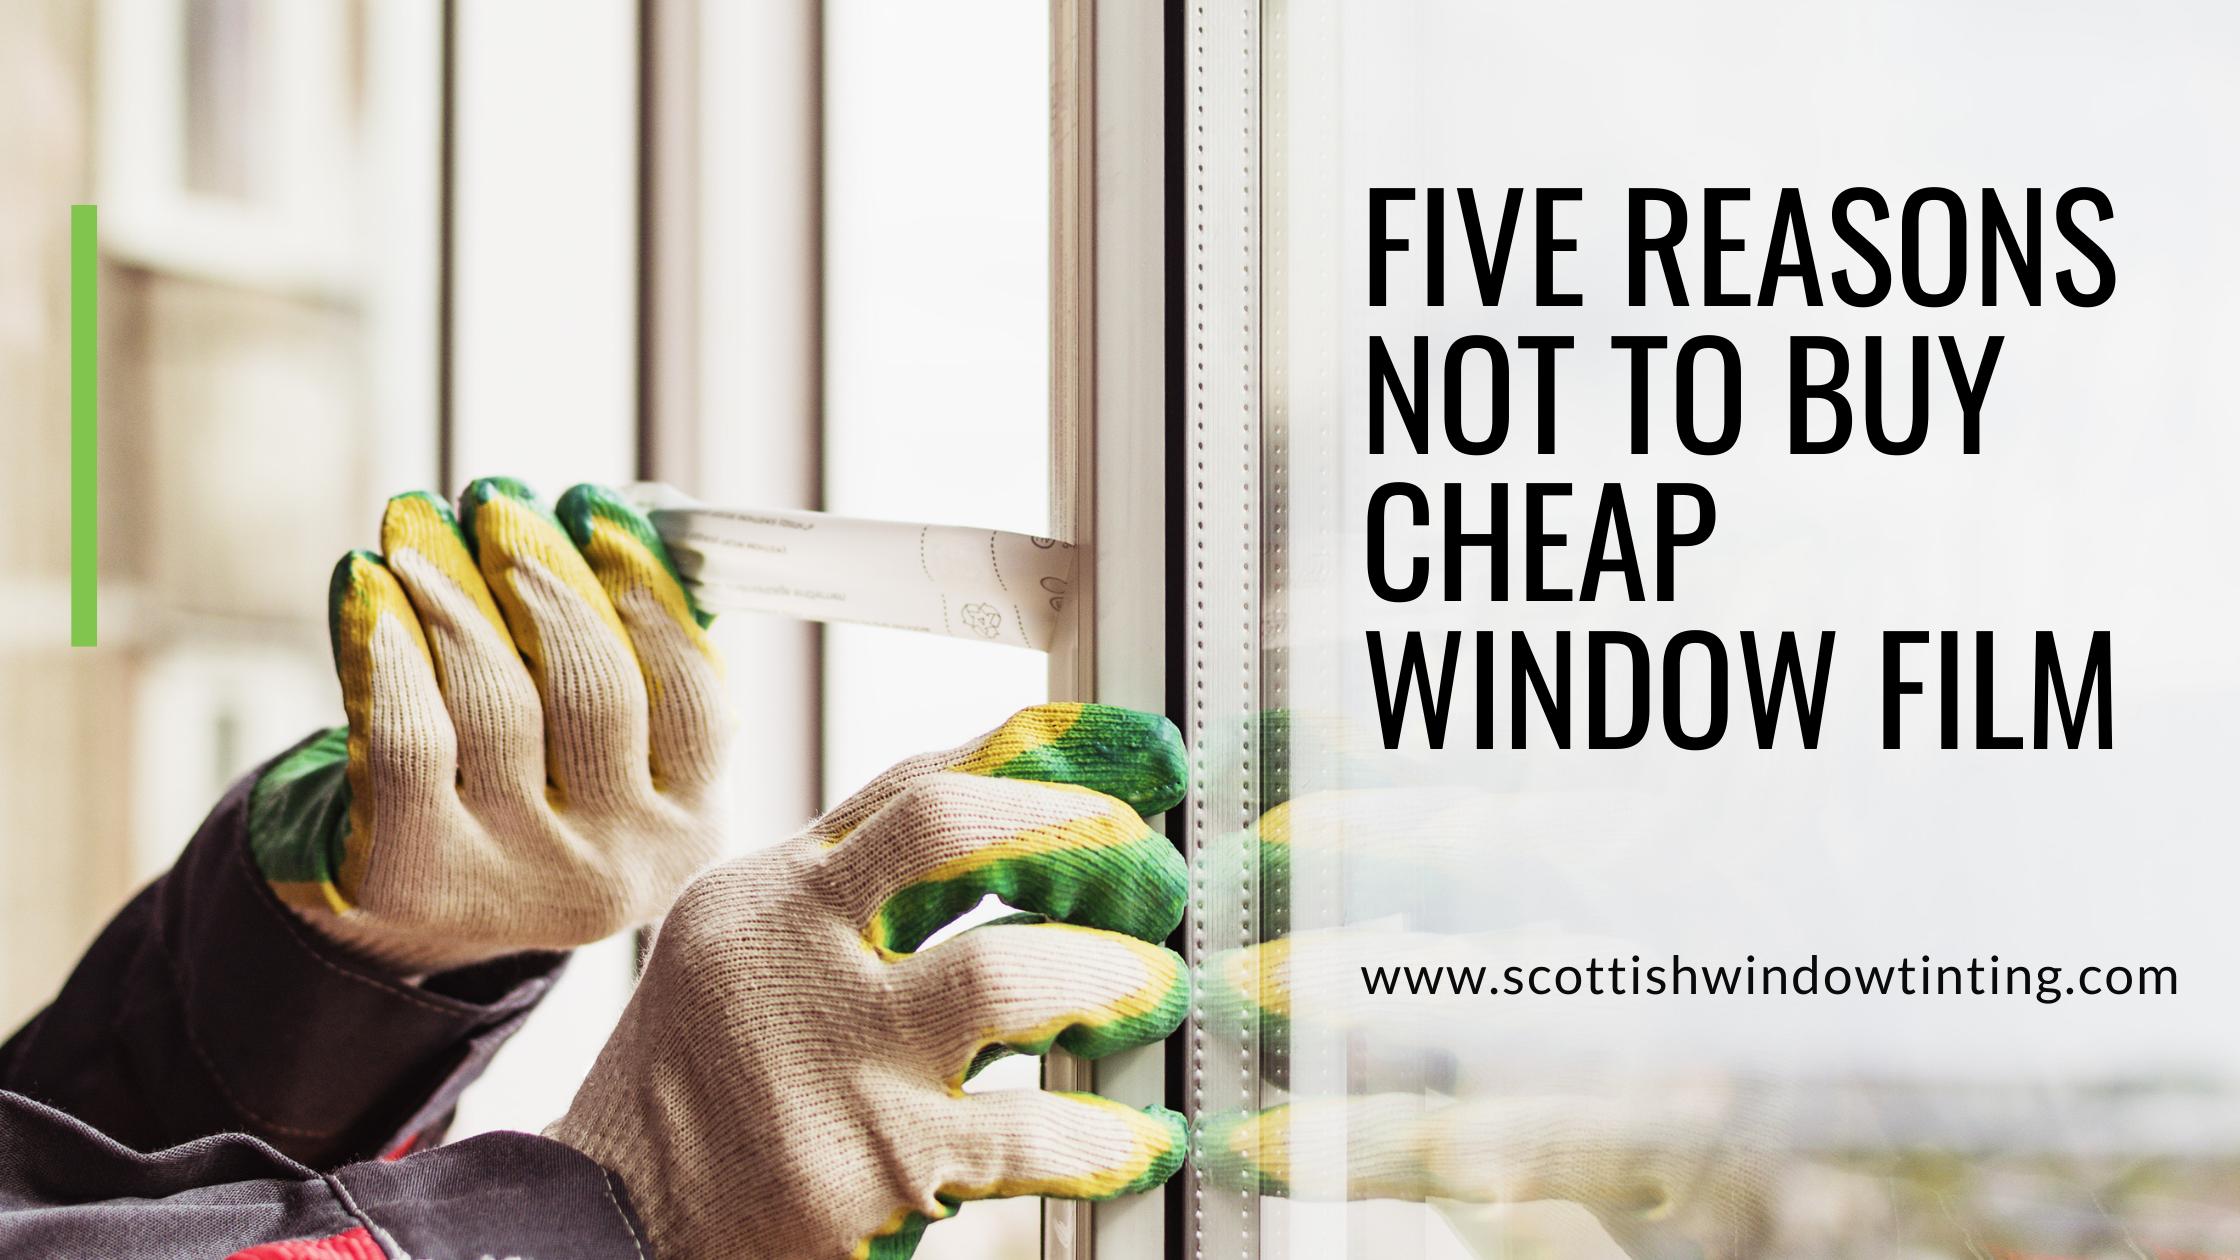 Five Reasons Not to Buy Cheap Window Film